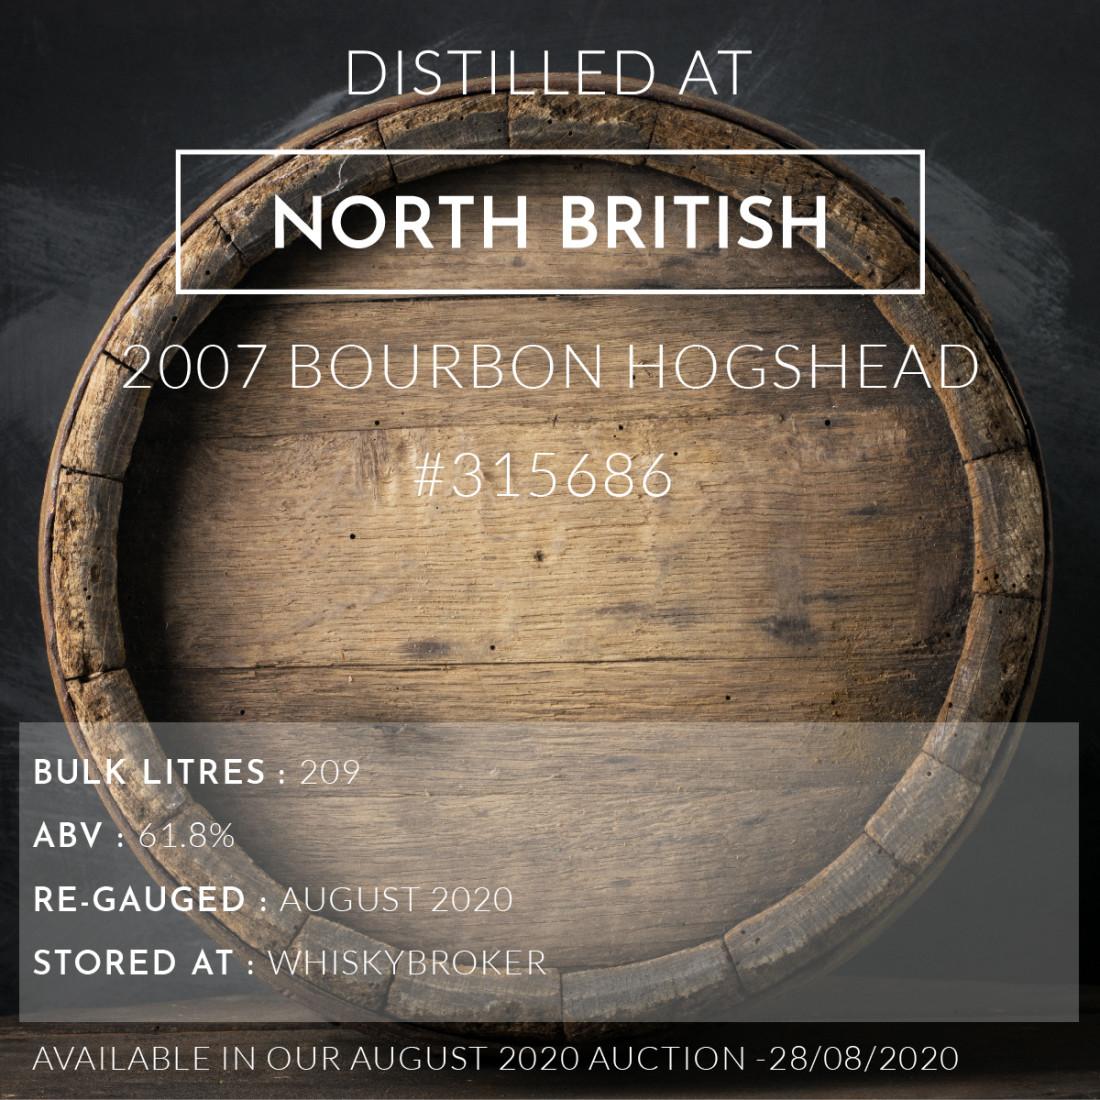 1 North British 2007 Bourbon Hogshead #315686 / Cask in storage at Whiskybroker